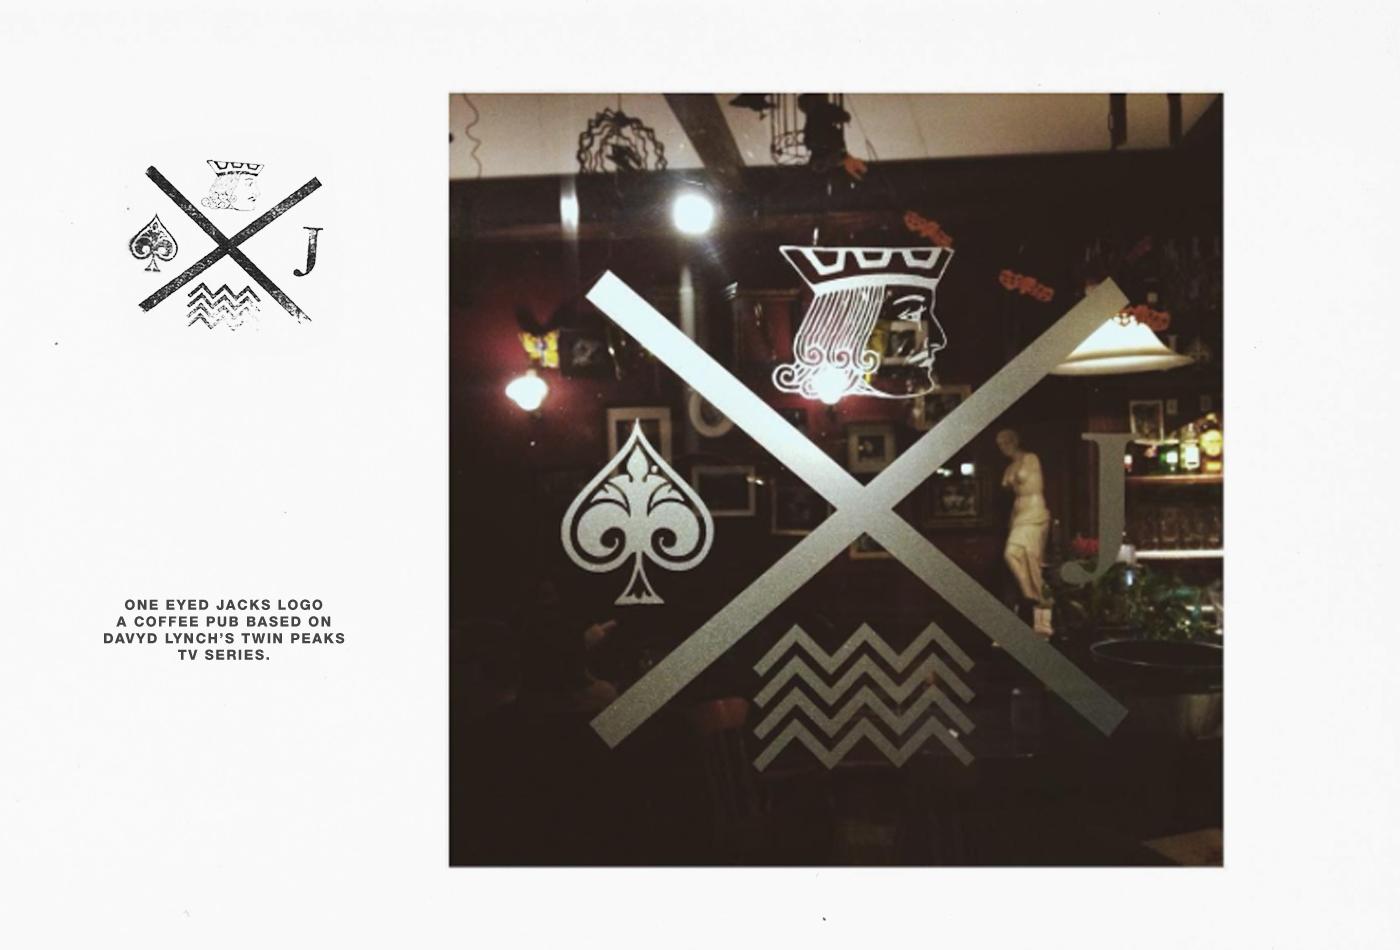 vacaliebres-twin-peaks-oneeyedjacks-david-lynch-coffee-logo-branding